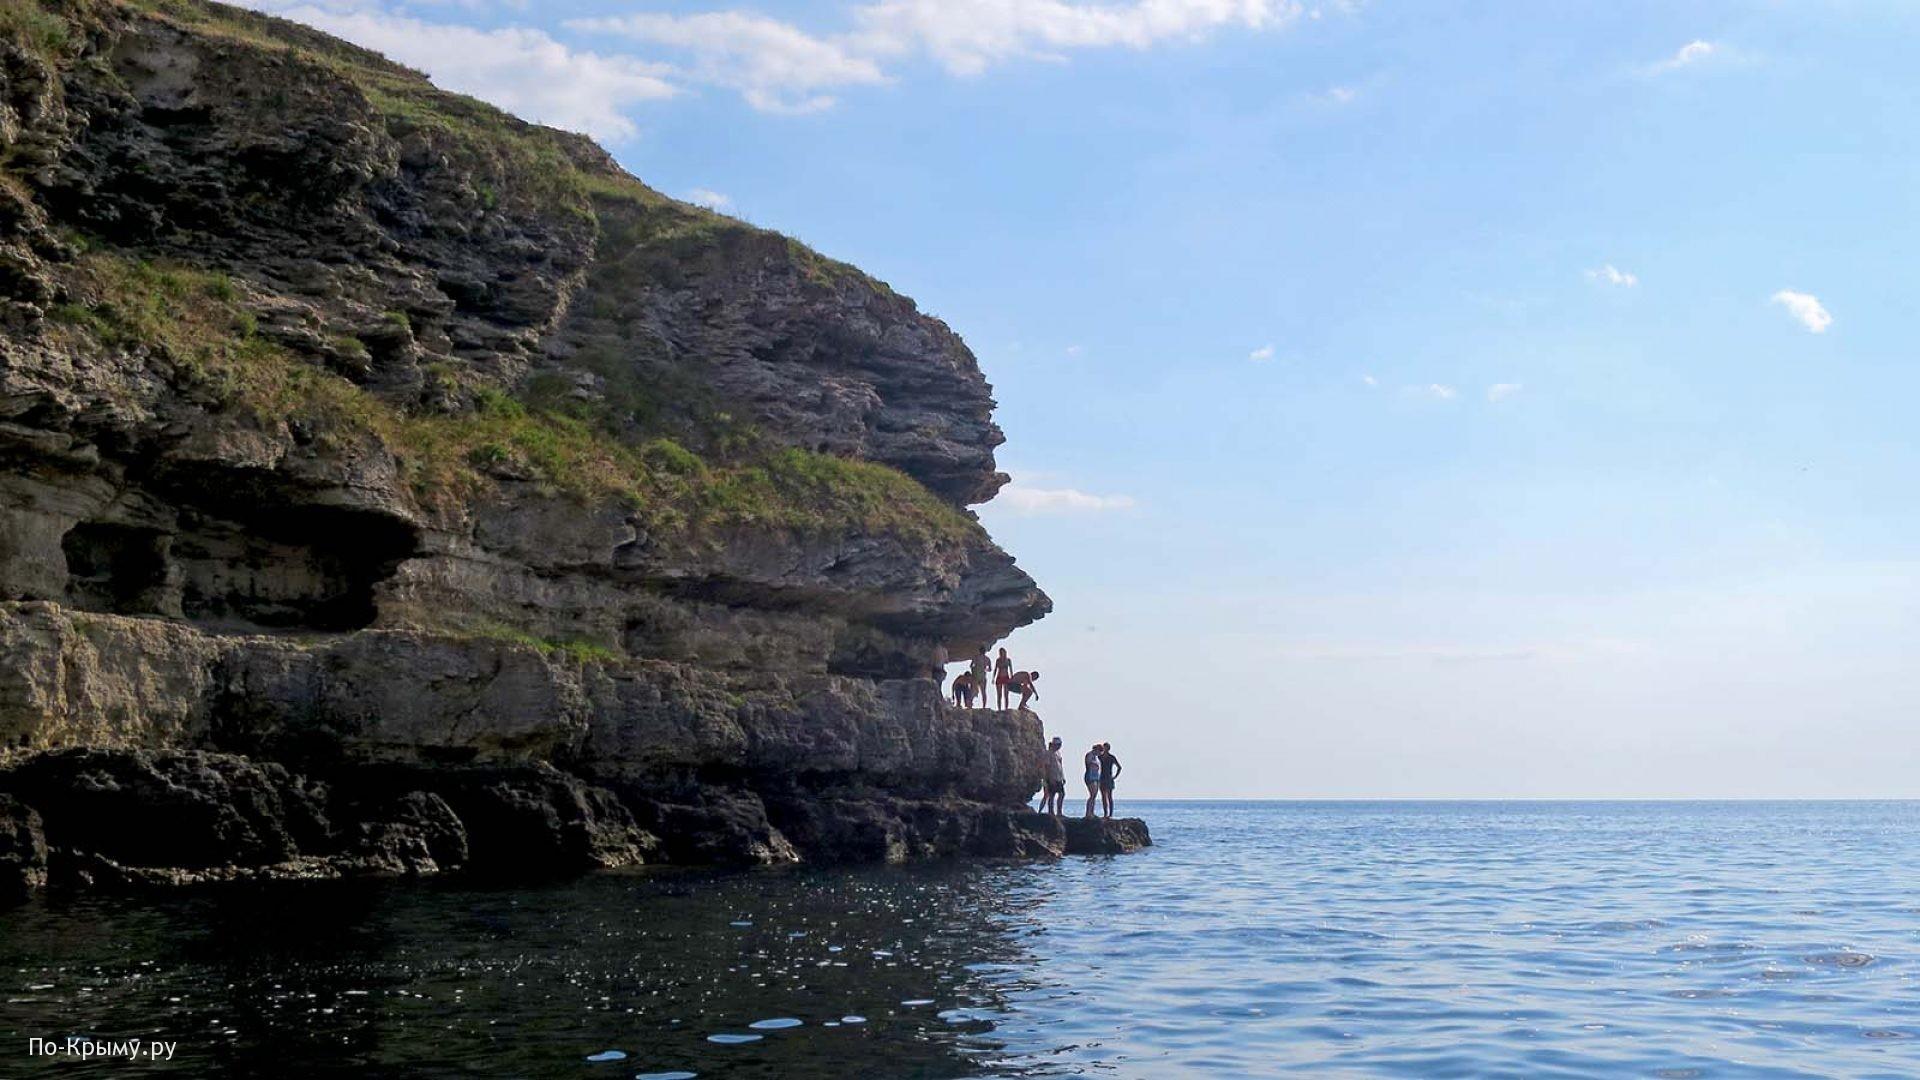 Обрывистый берег Малого Атлеша